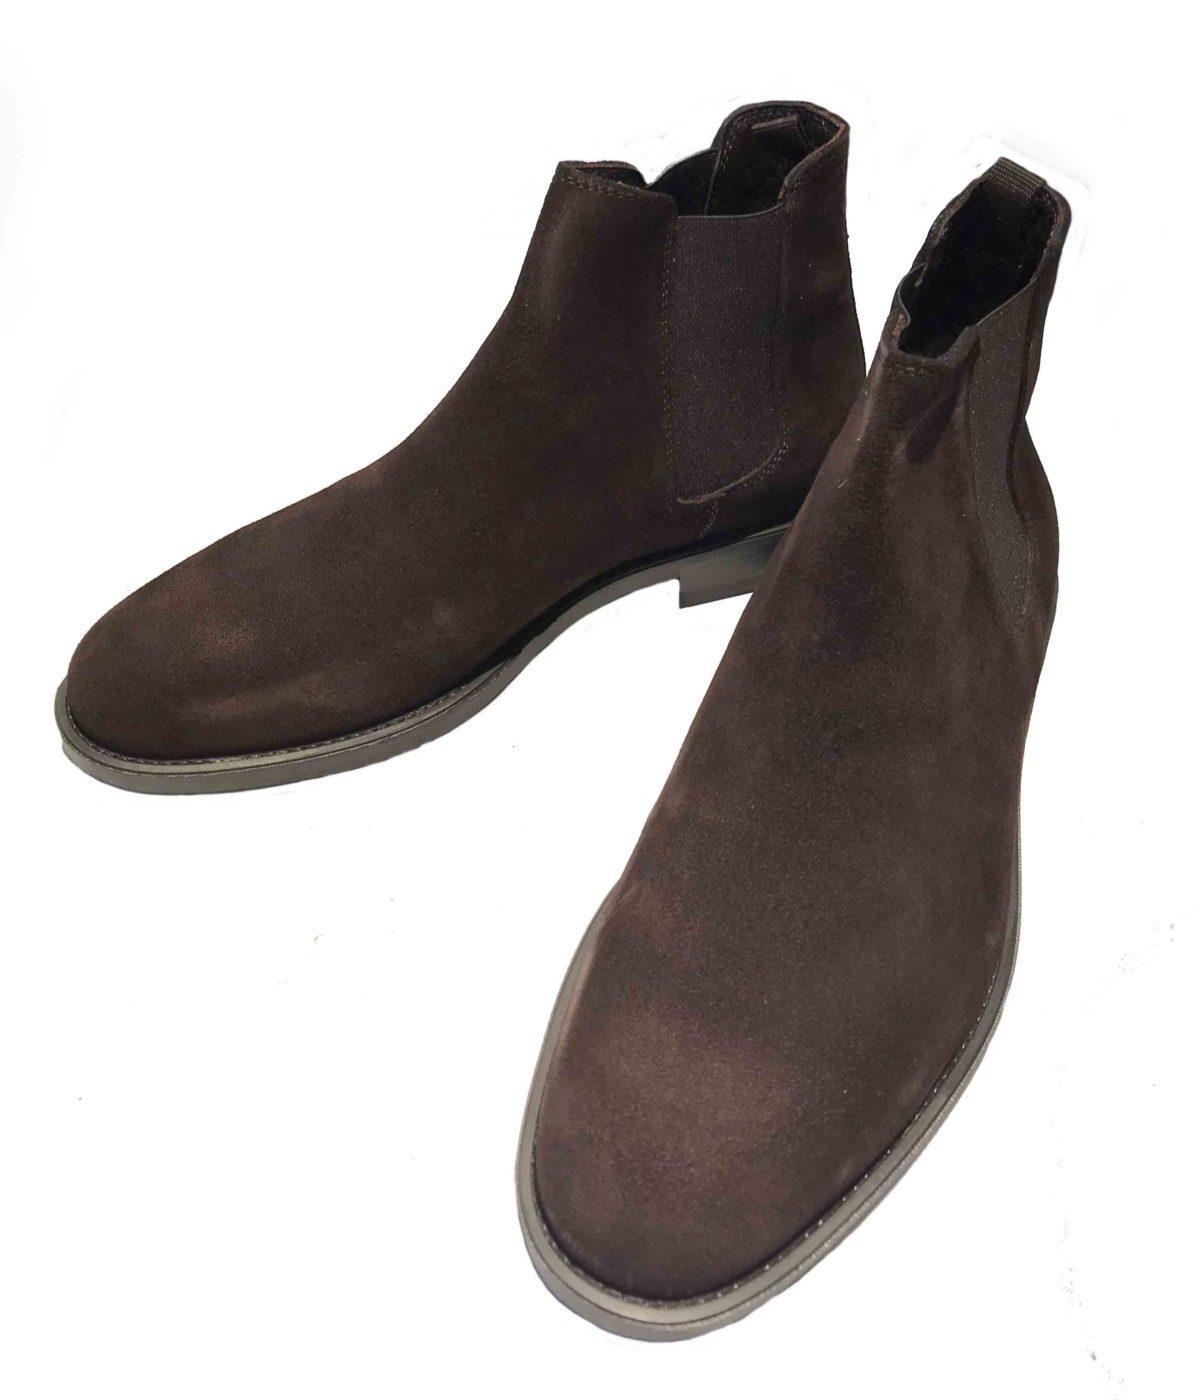 Ben Brown |BB 3170-8 Brown boot